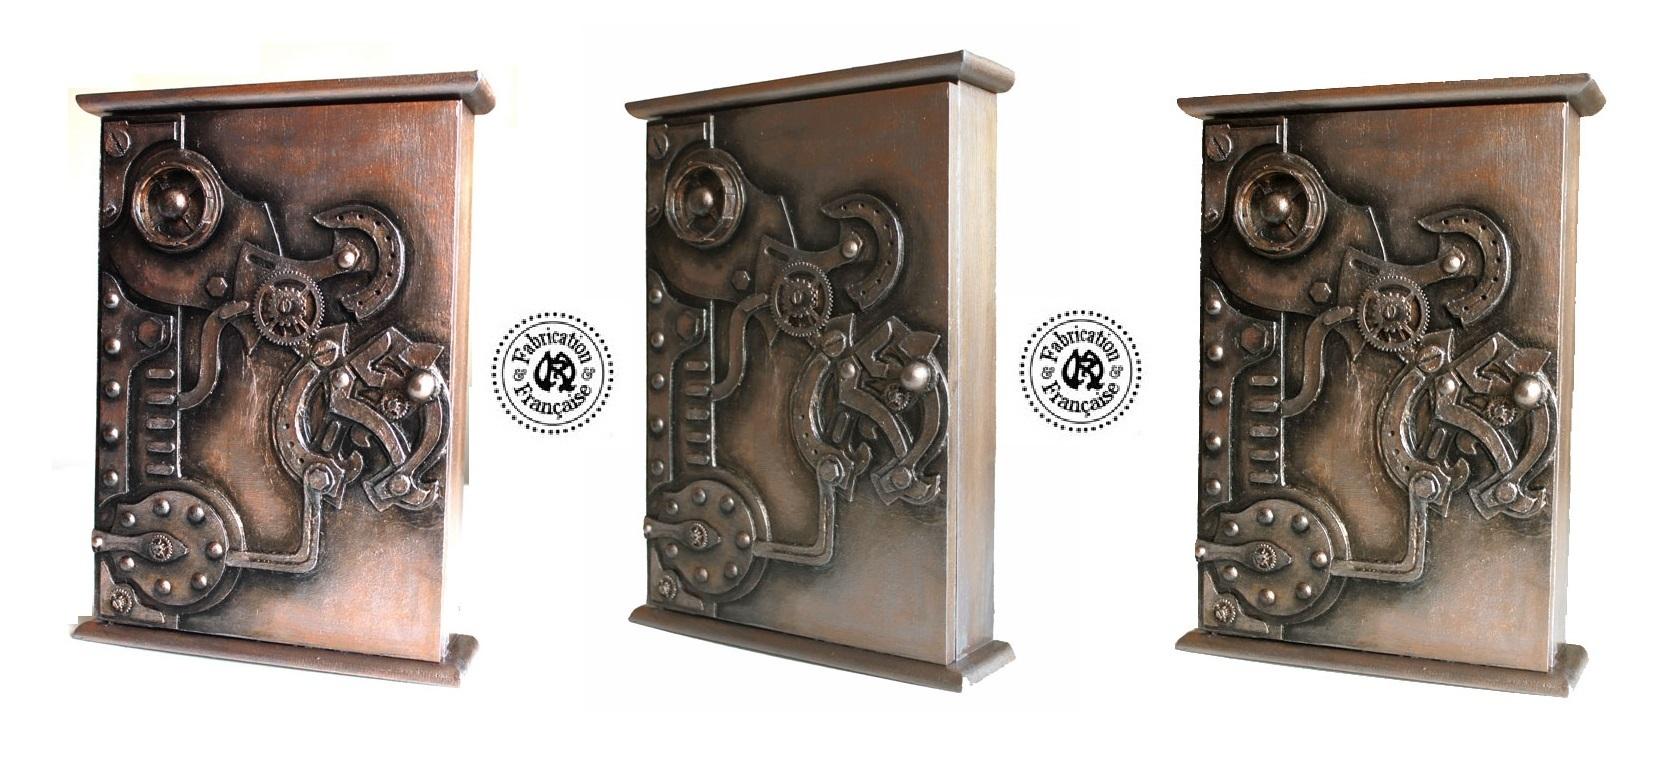 boite clefs en bois peint patin style steampunk. Black Bedroom Furniture Sets. Home Design Ideas